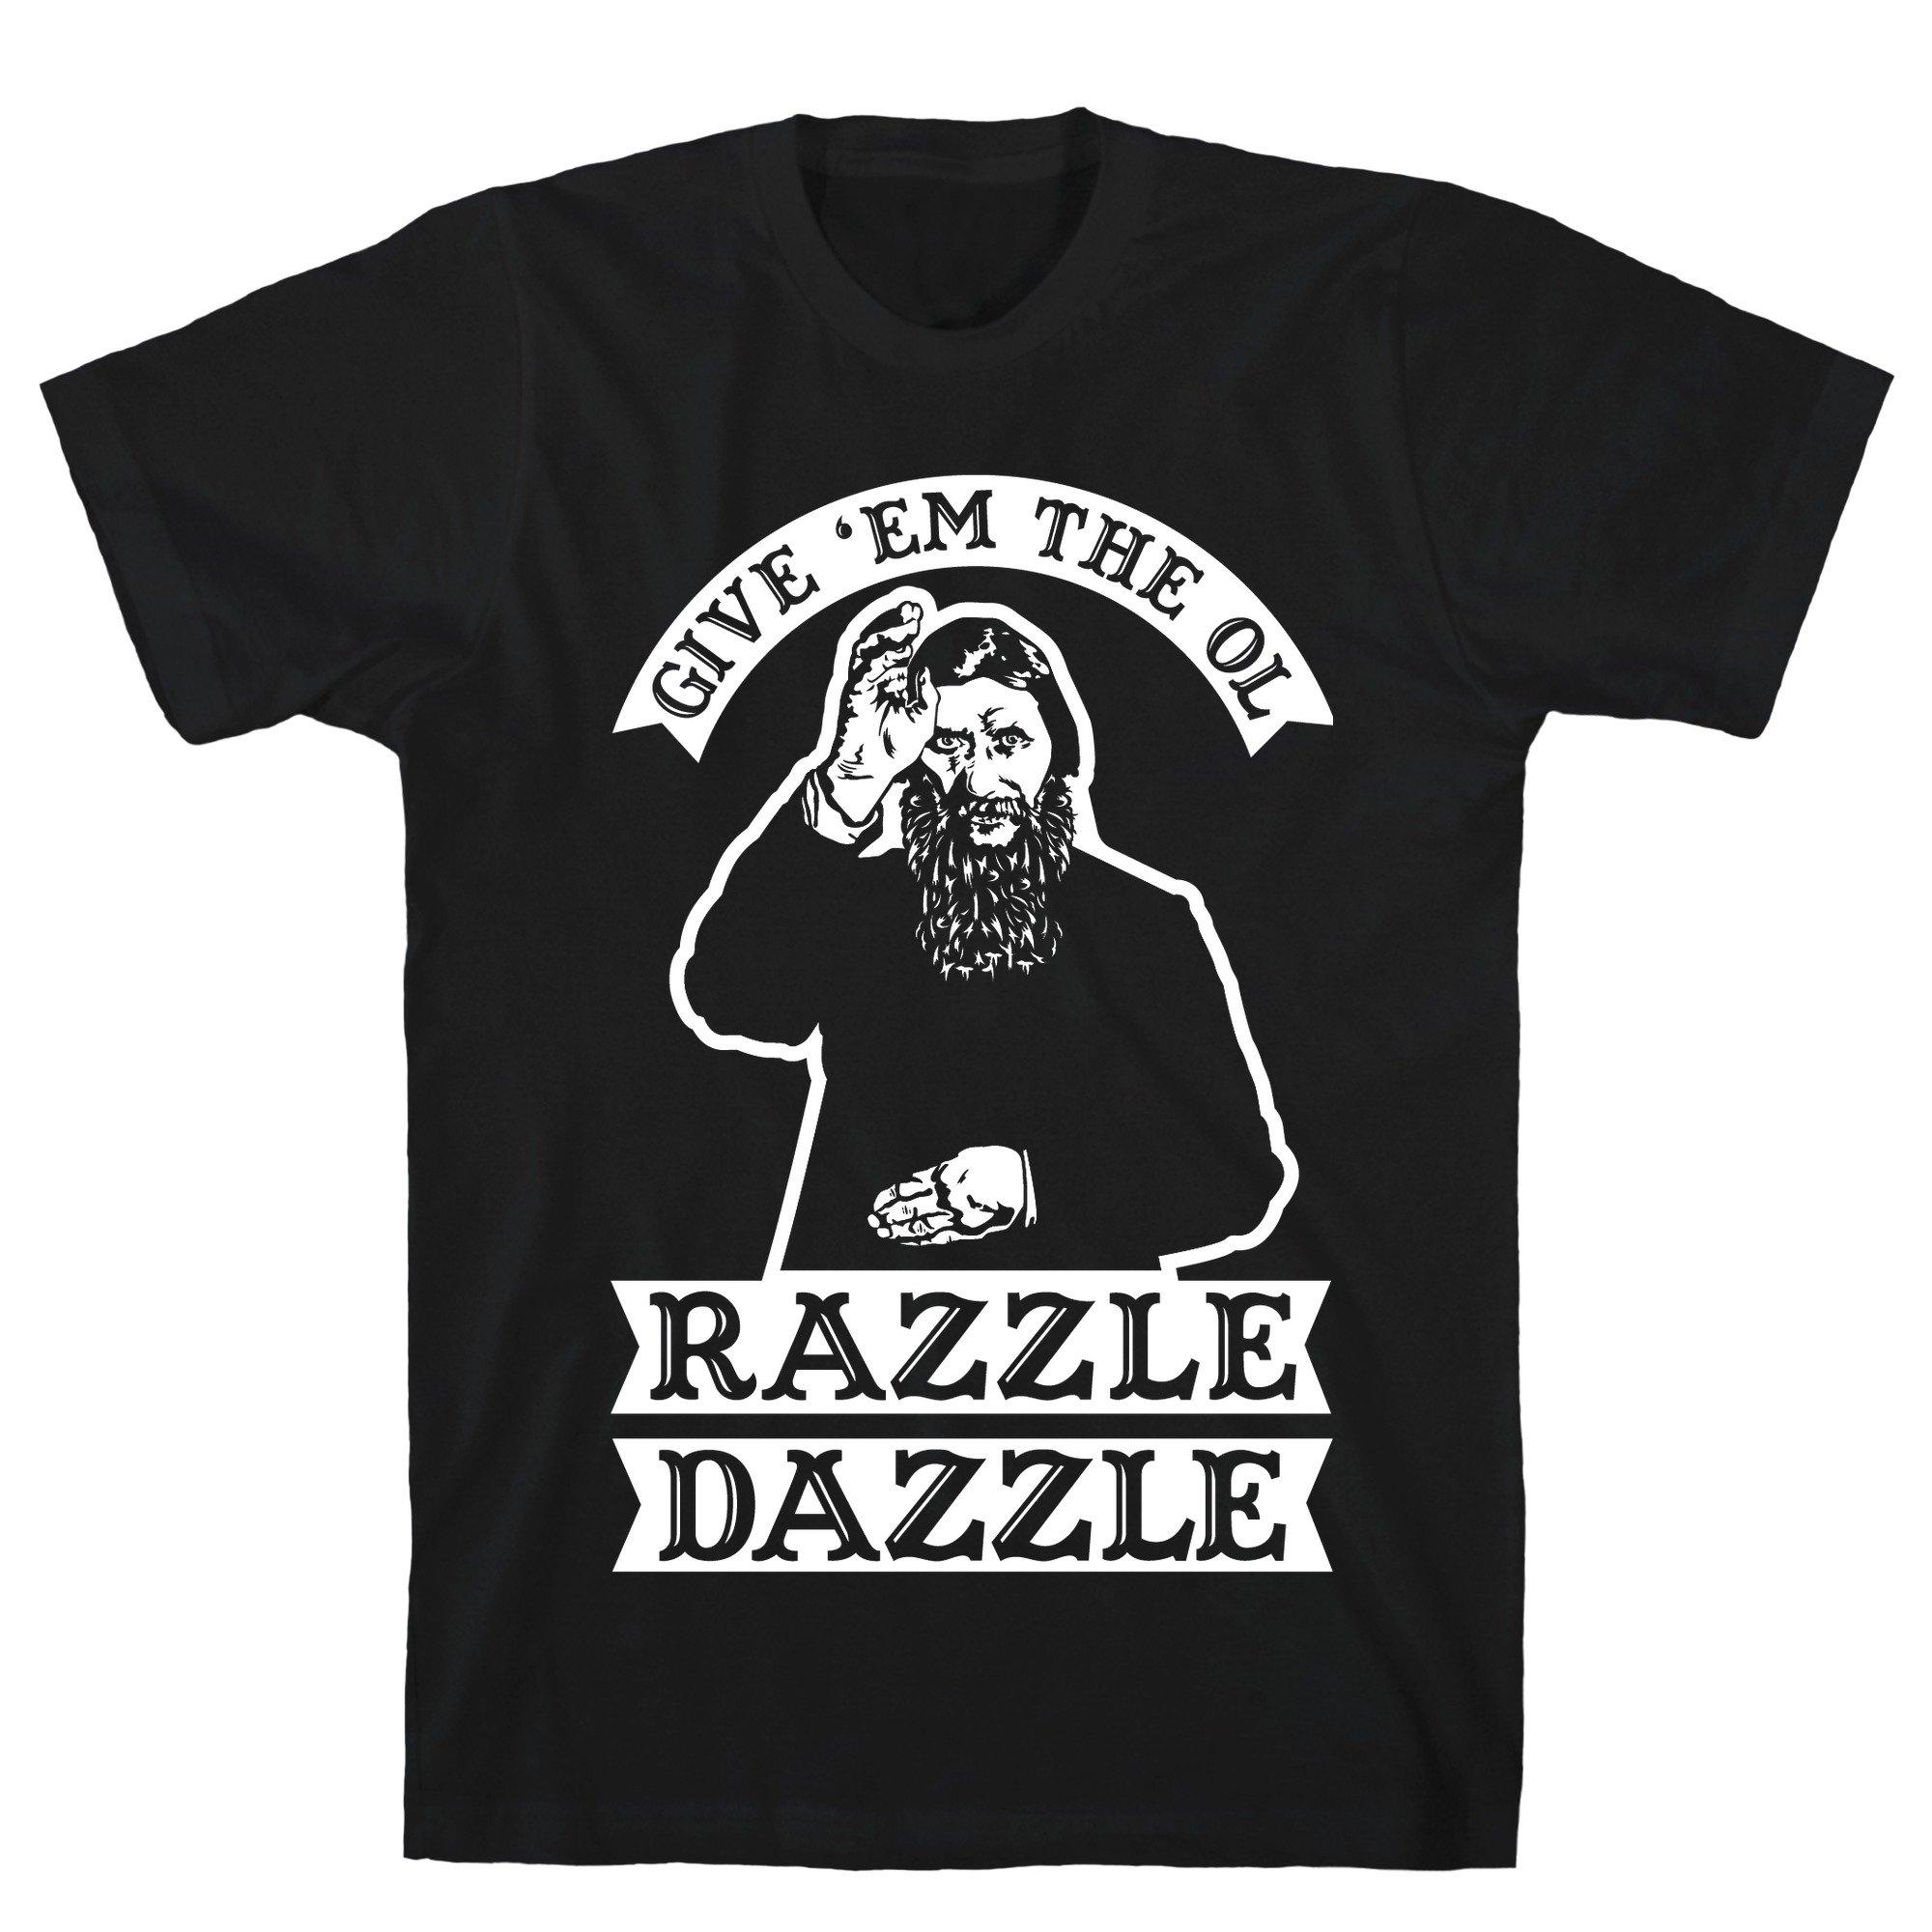 Give Em The Ol Razzle Dazzle Rasputin Black S Ts Shirts